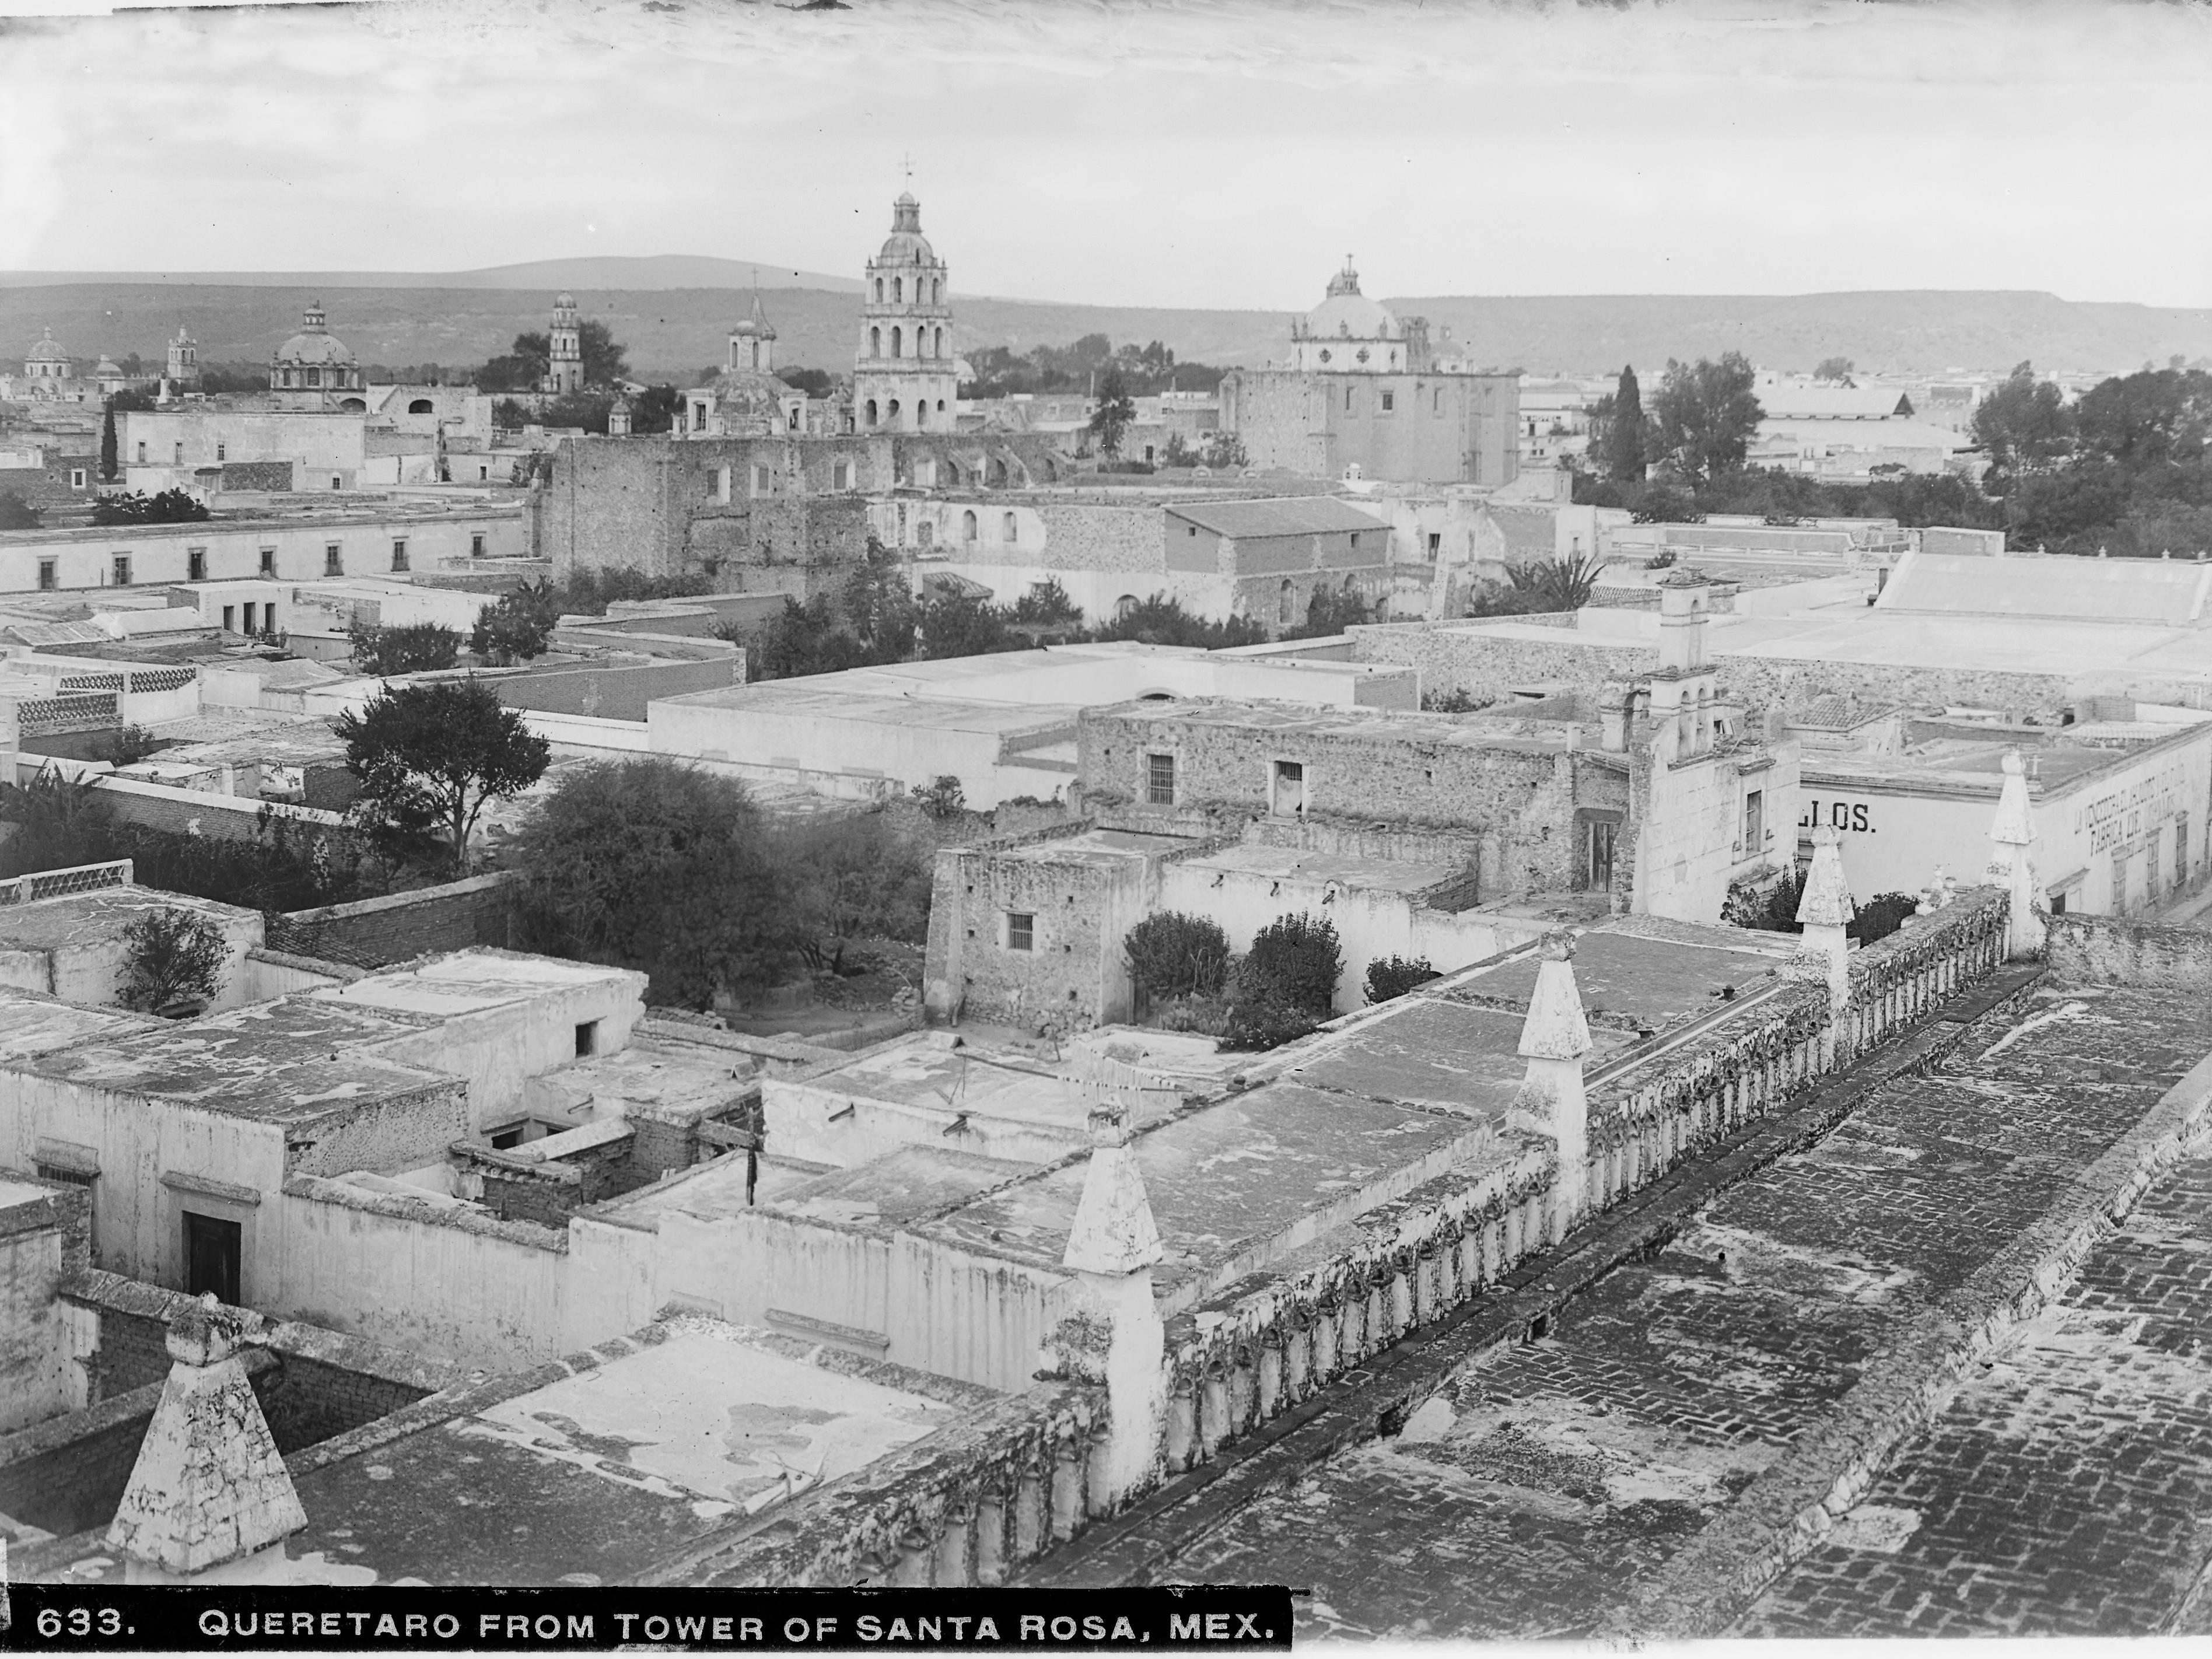 history of mexico city 1910 The oxford history of mexico william beezley, michael meyer, editors isbn-13: modernization and public health in mexico city, 1876-1910 claudia agostoni.